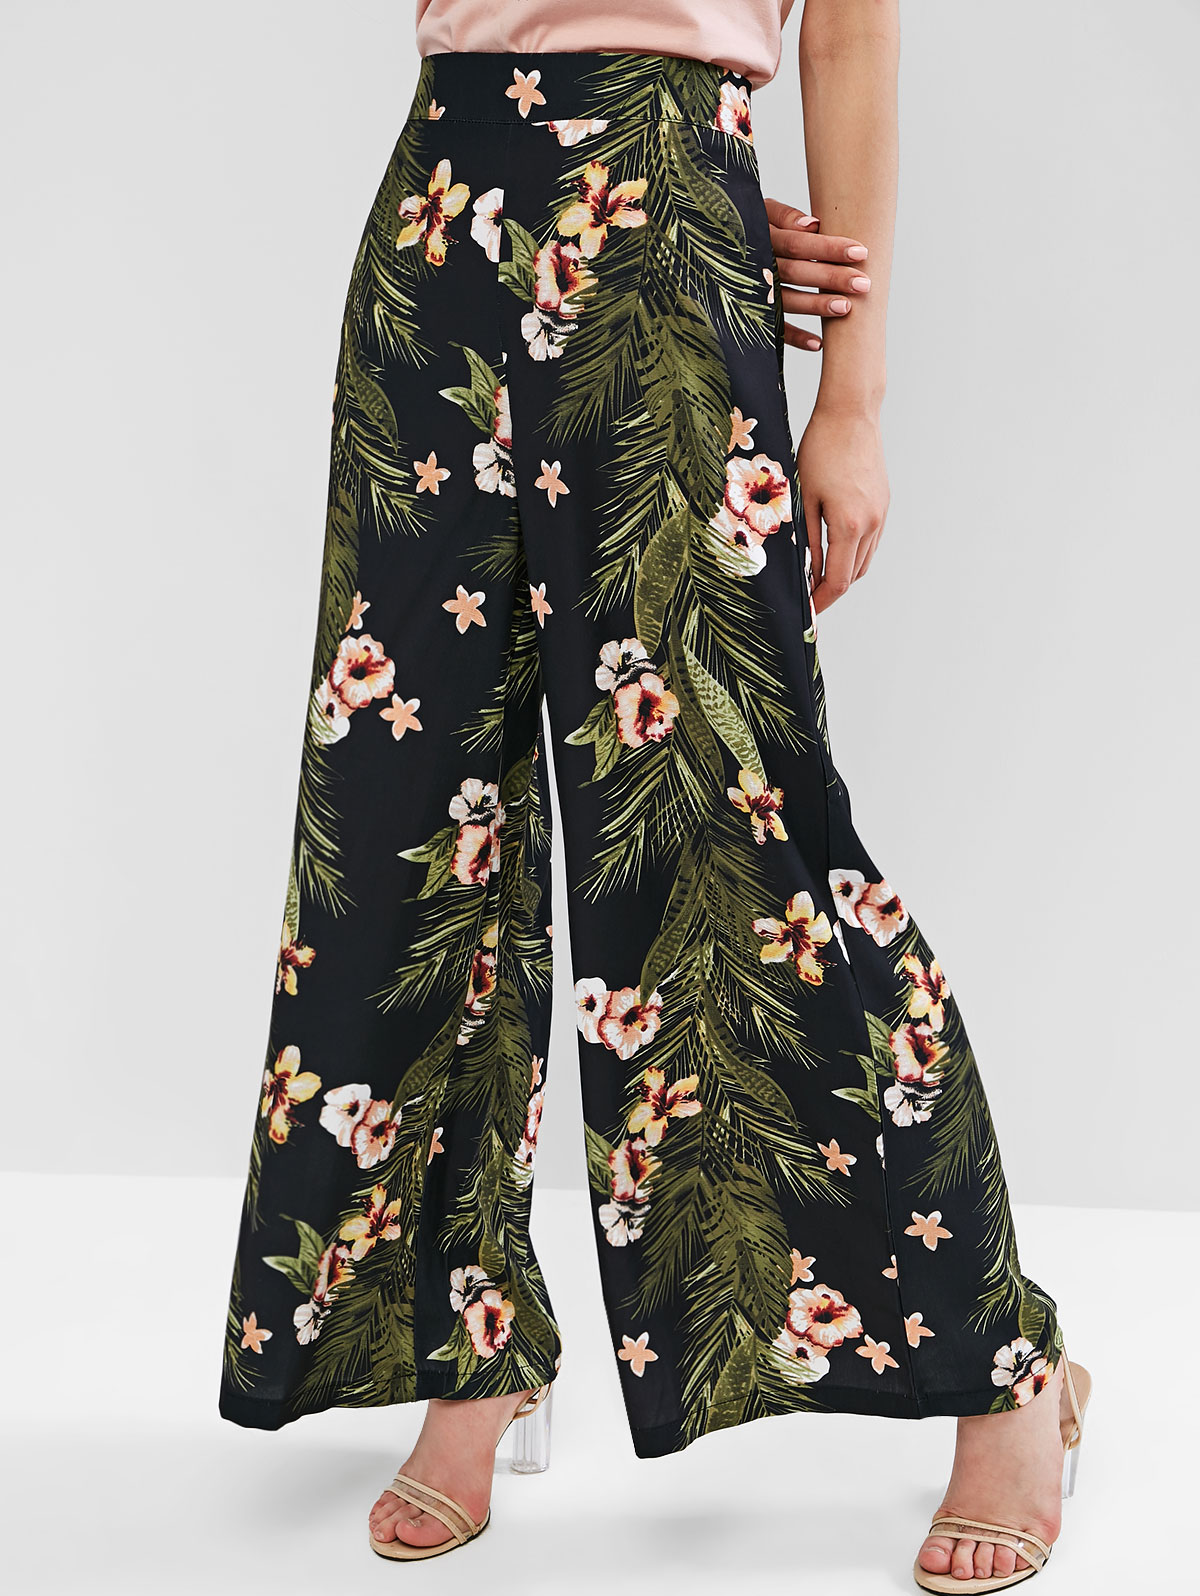 ZAFUL 2019 Pantalones de mujer hojas florales bolsillos de costura pantalones de Mujer Pantalones de pierna ancha mujer verano playa pantalones bohemios